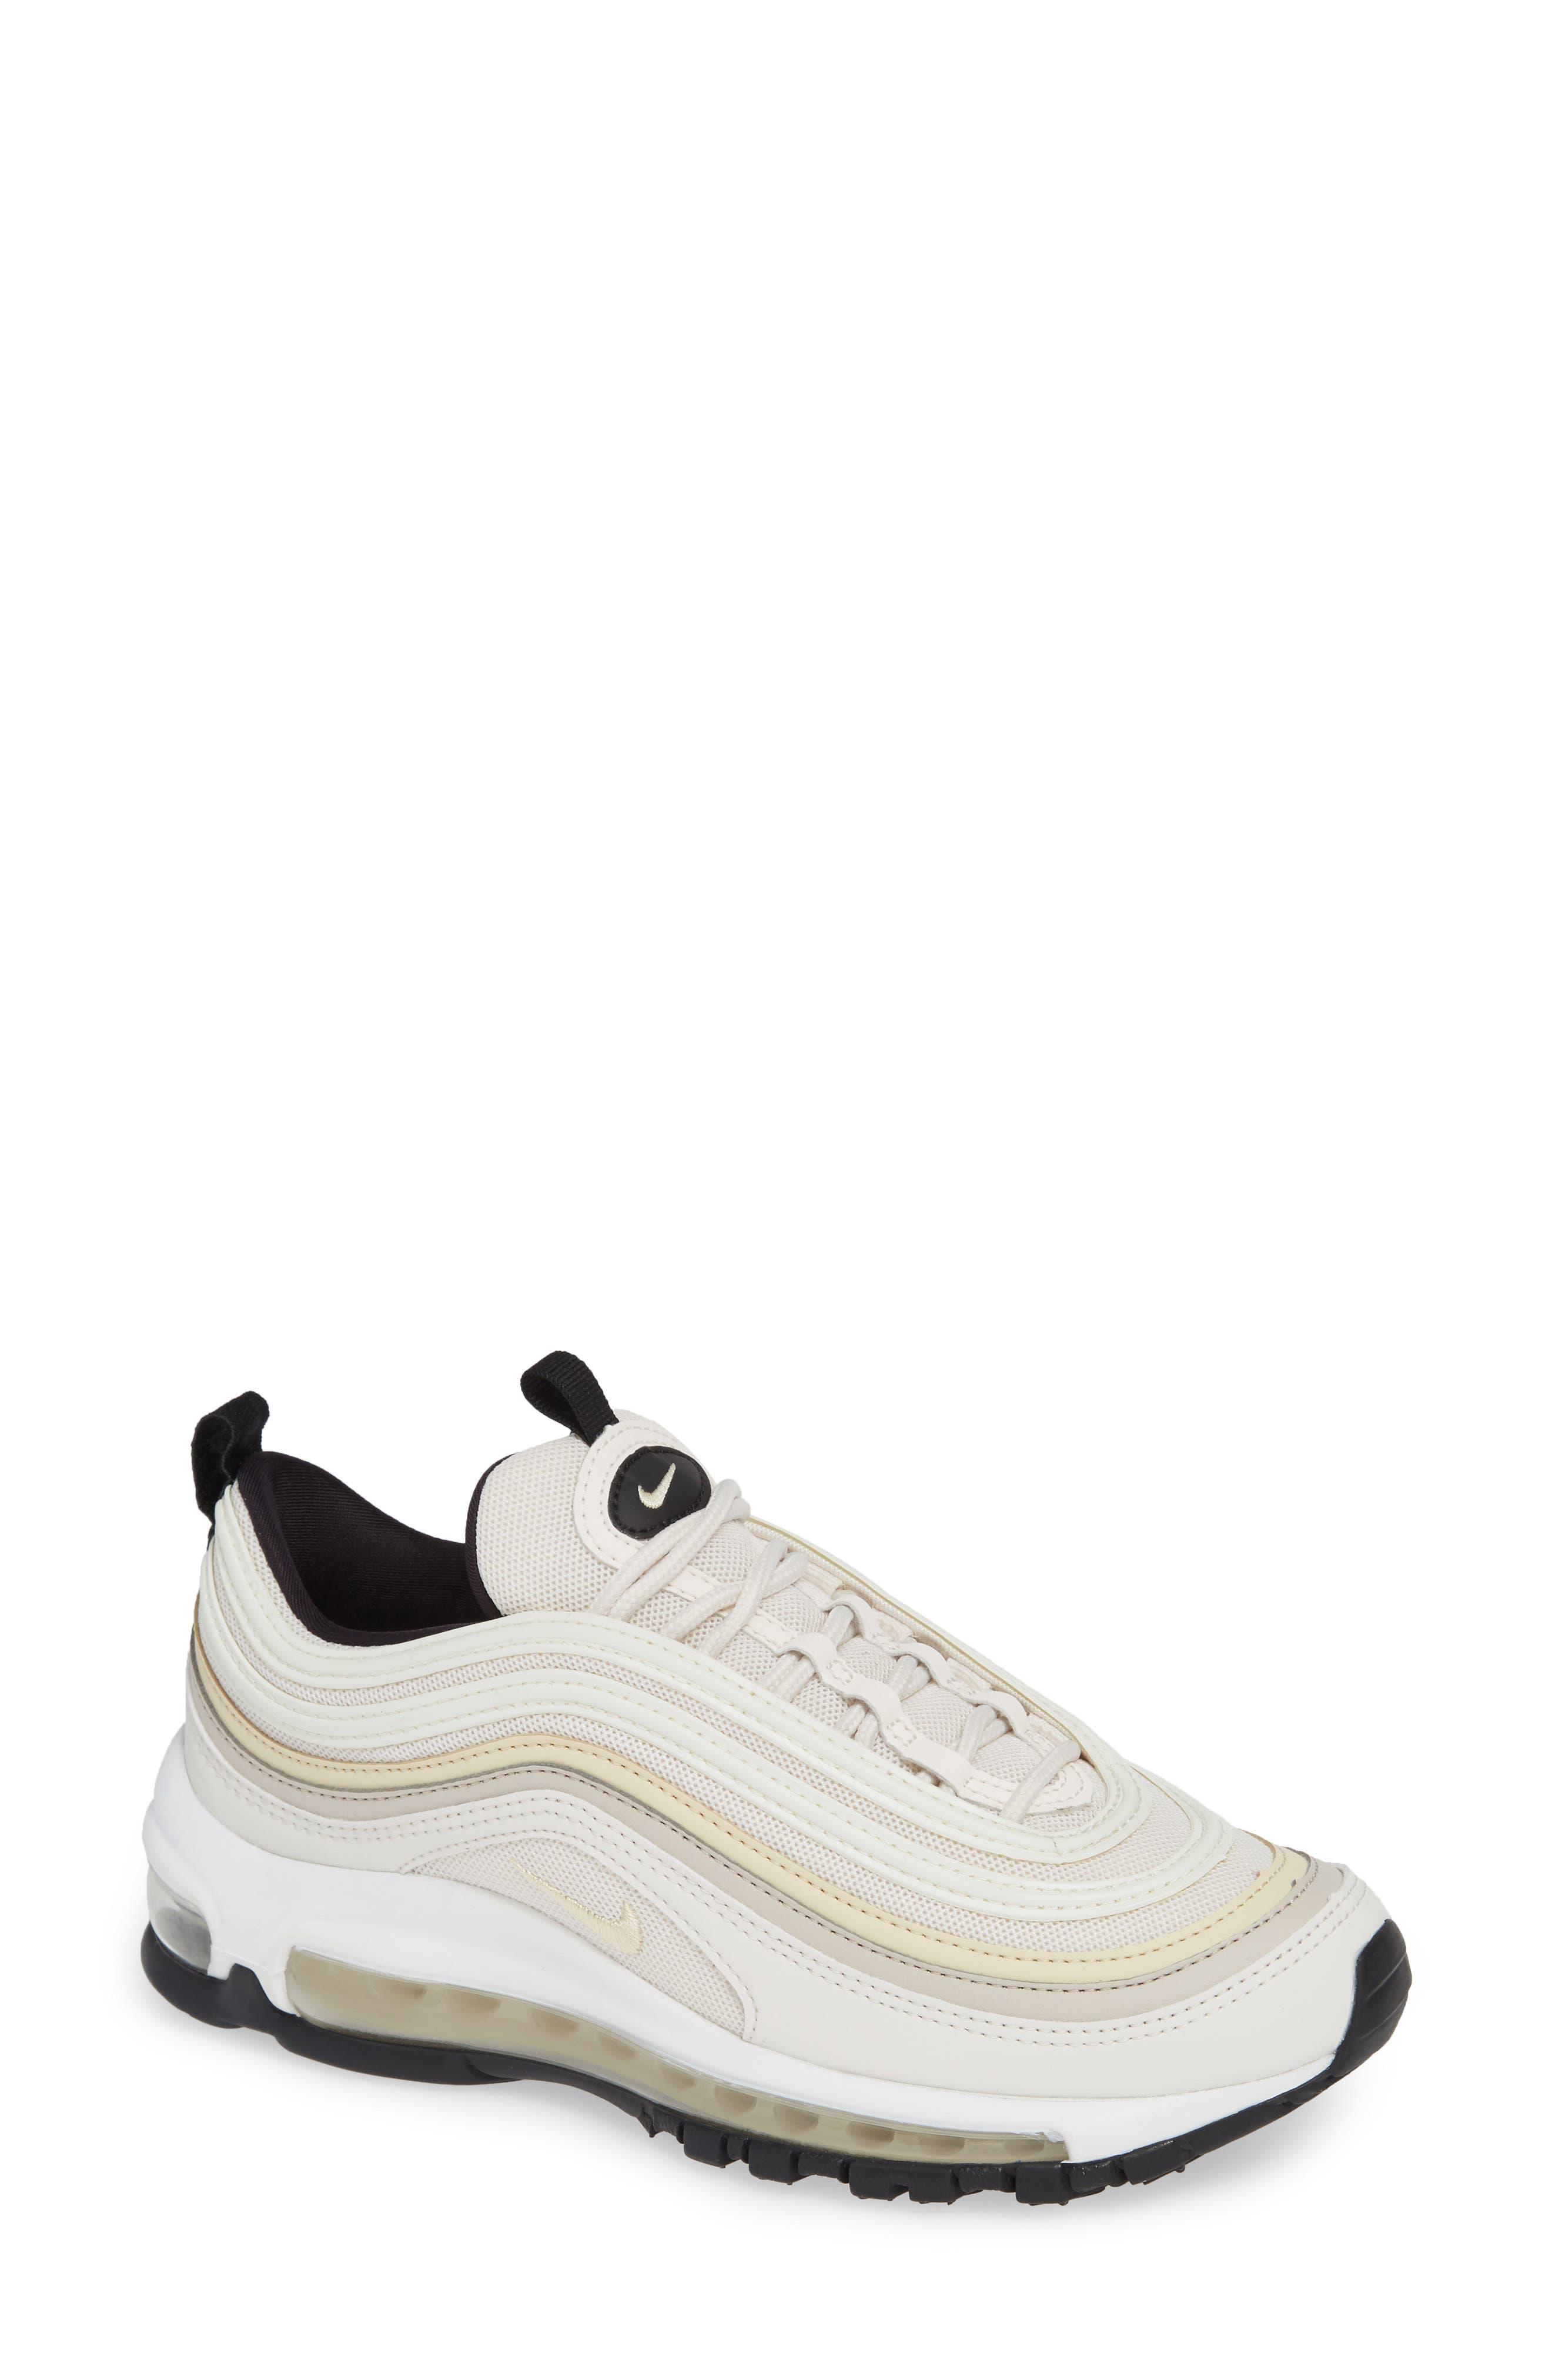 Air Max 97 Sneaker,                             Main thumbnail 1, color,                             250